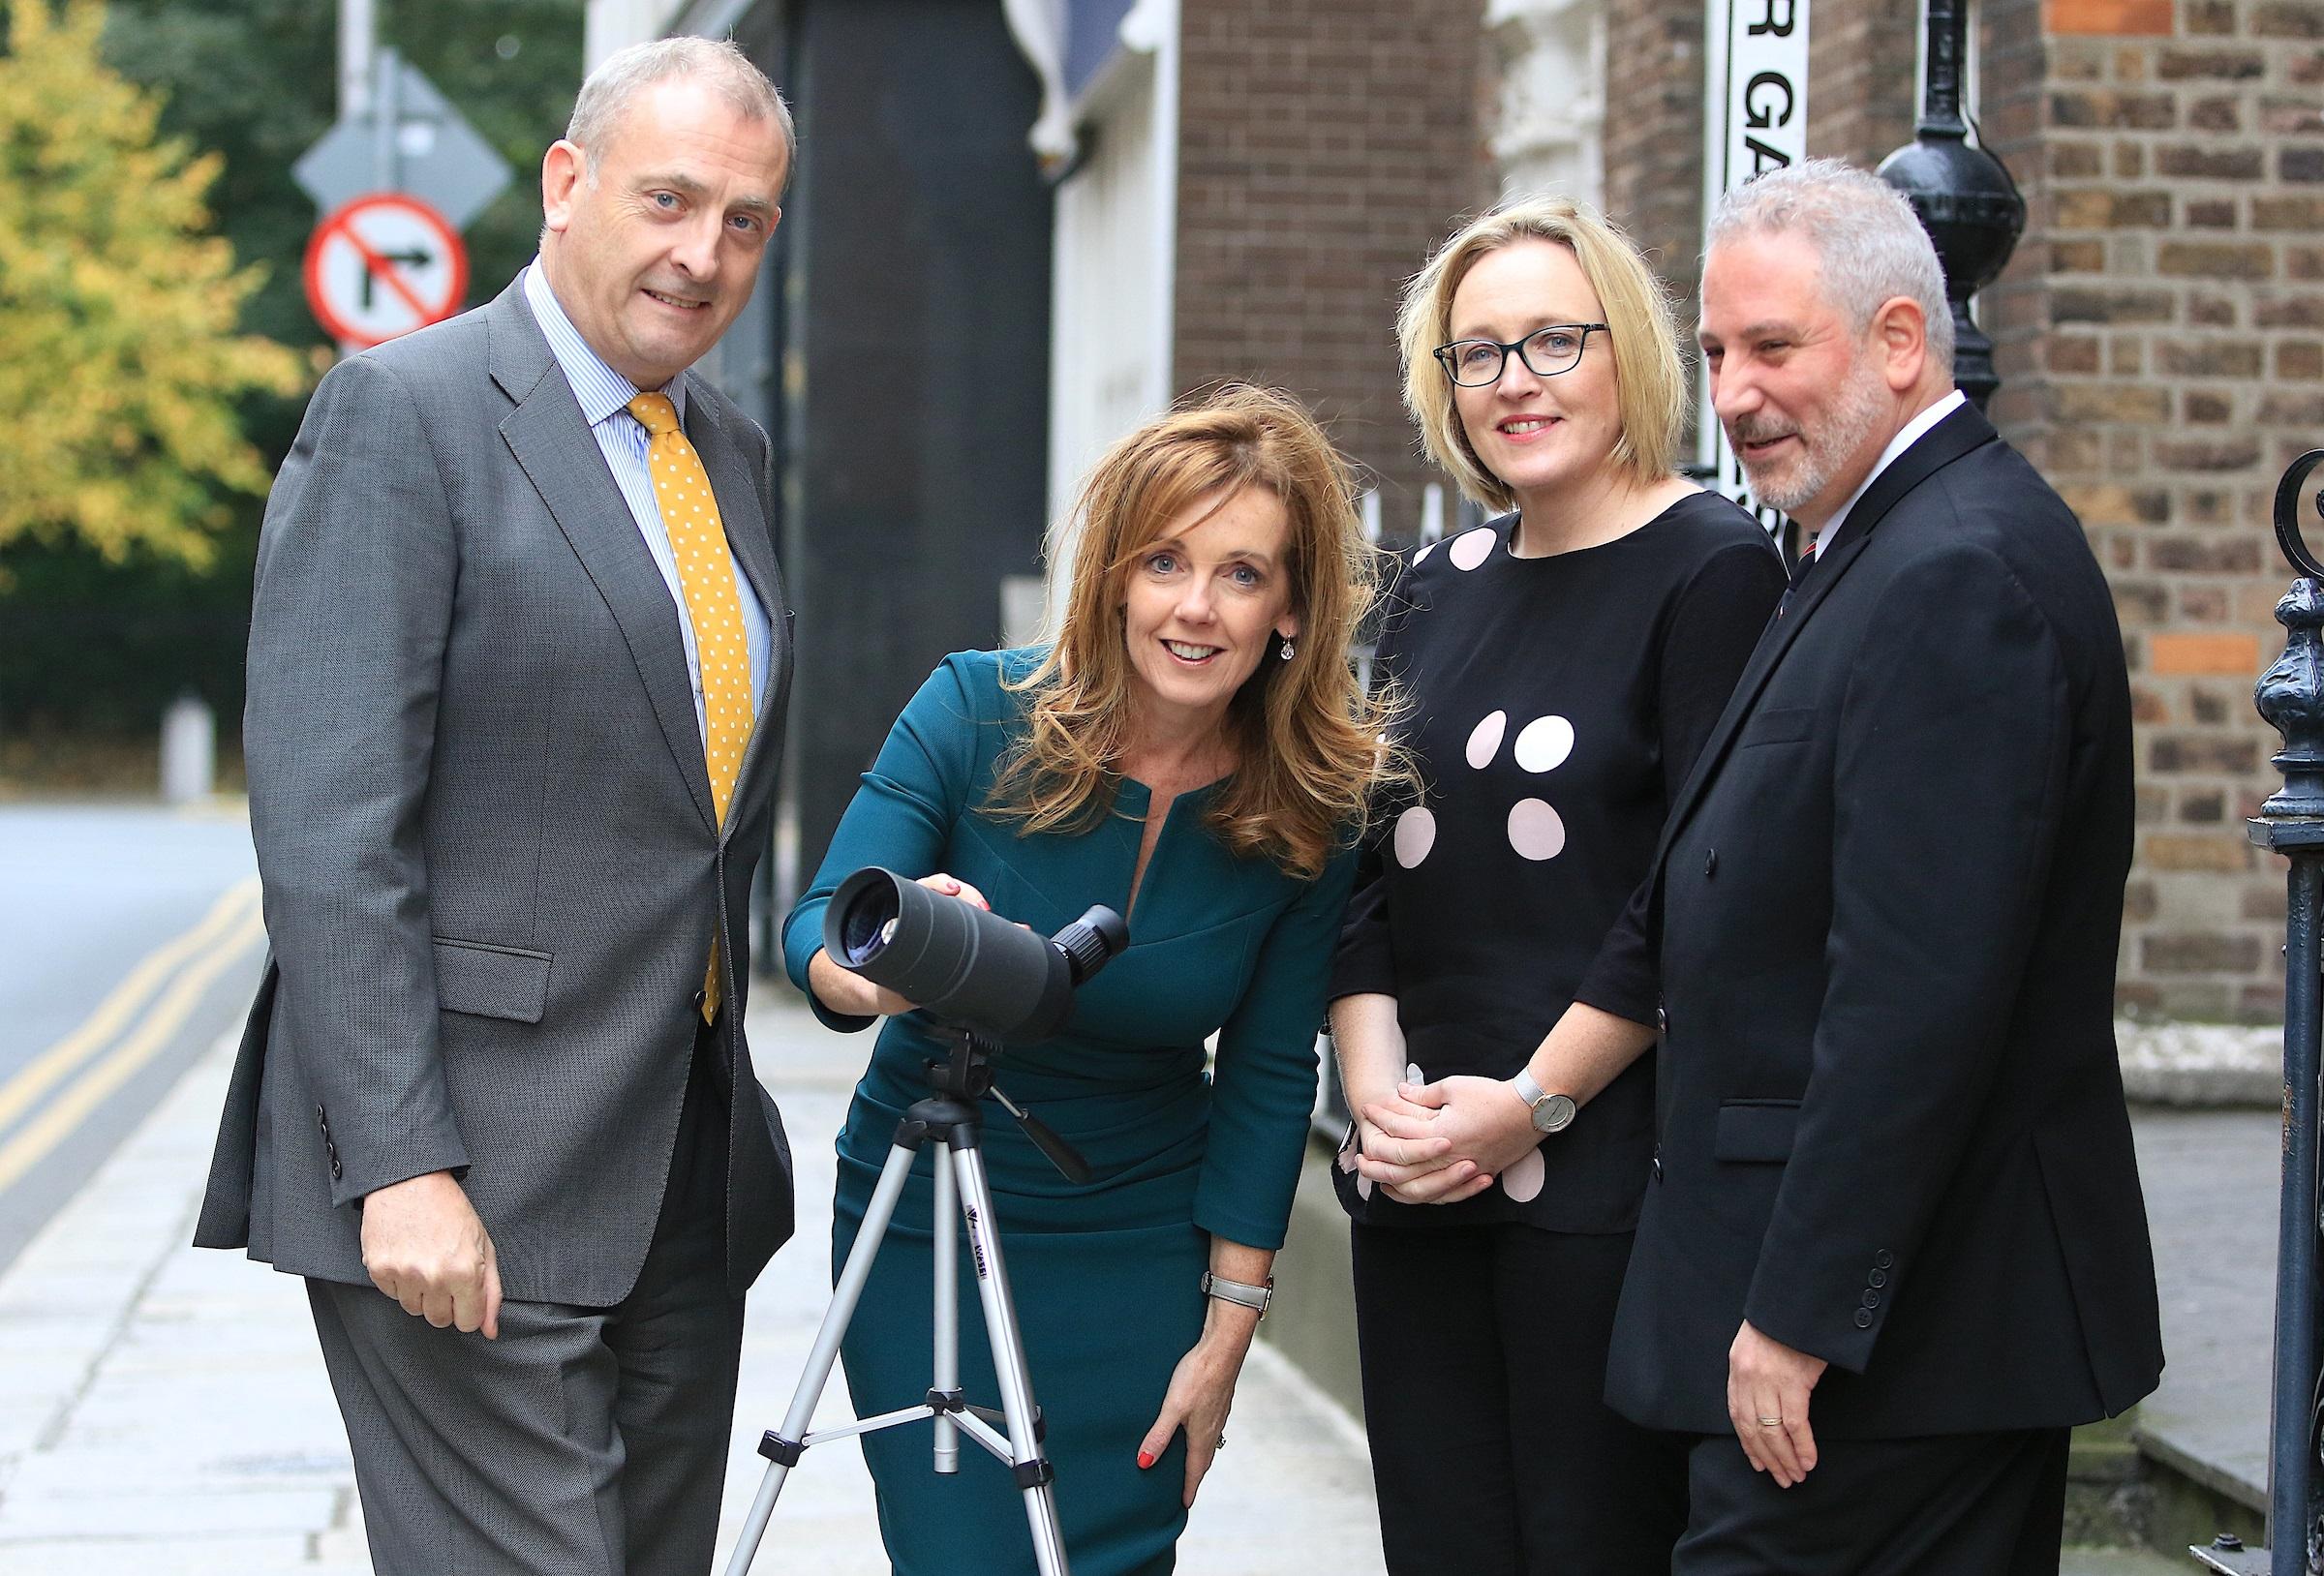 Neil McDonnell, CEO, ISME Alison Cowzer, Director, East Coast Bakehouse, Elizabeth Fallon, Key Account Manager, Sunday Business Post and  John Popolizio, CEO, Sovy